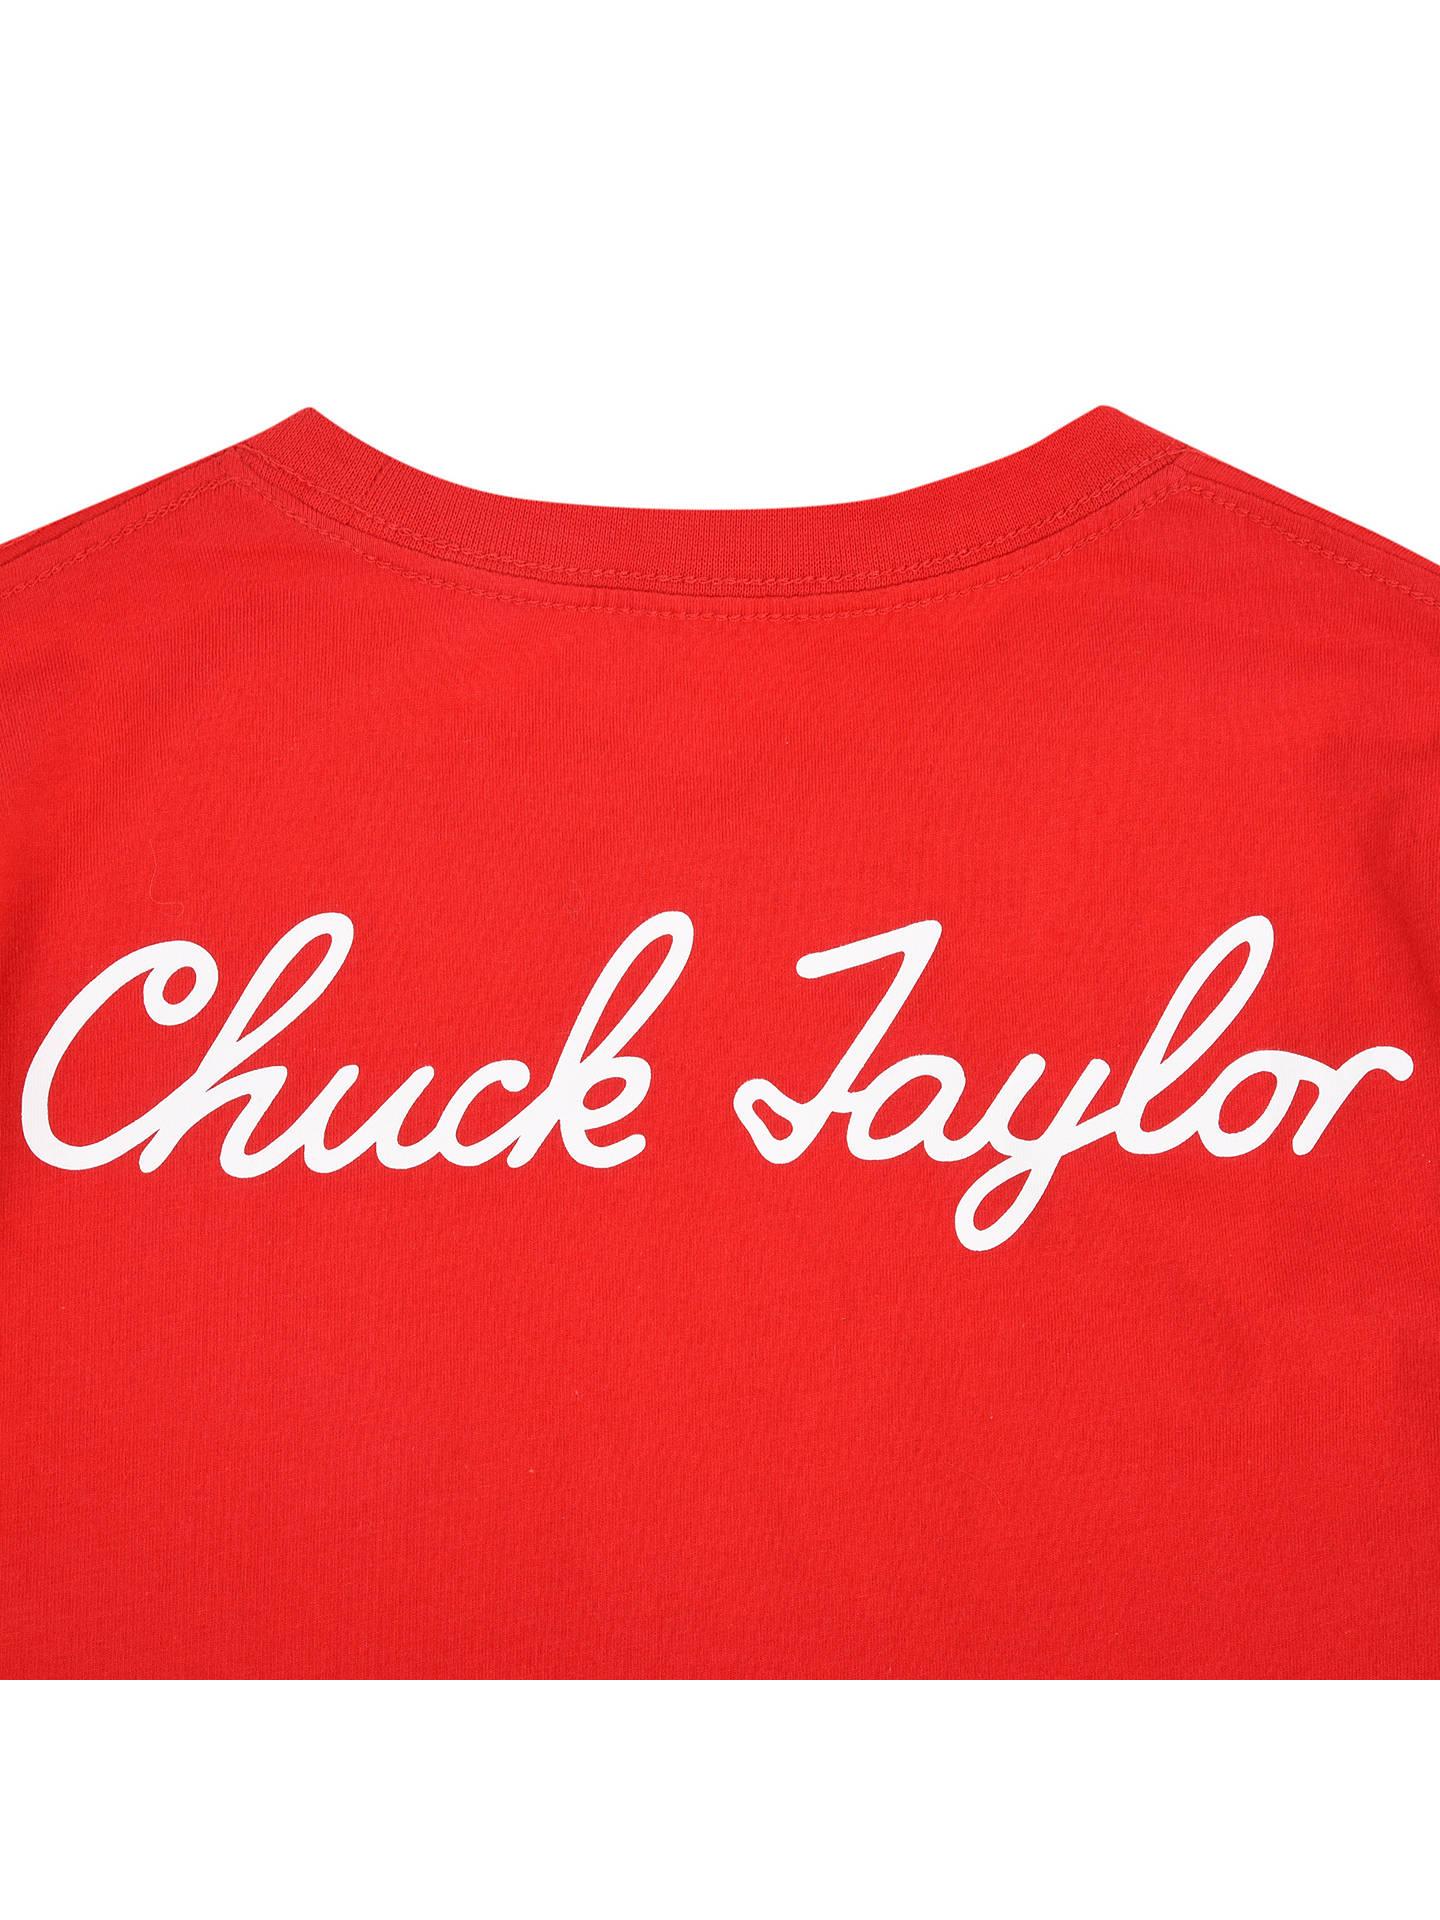 Converse Boys' Chuck Taylor All Star Print T Shirt, Red at